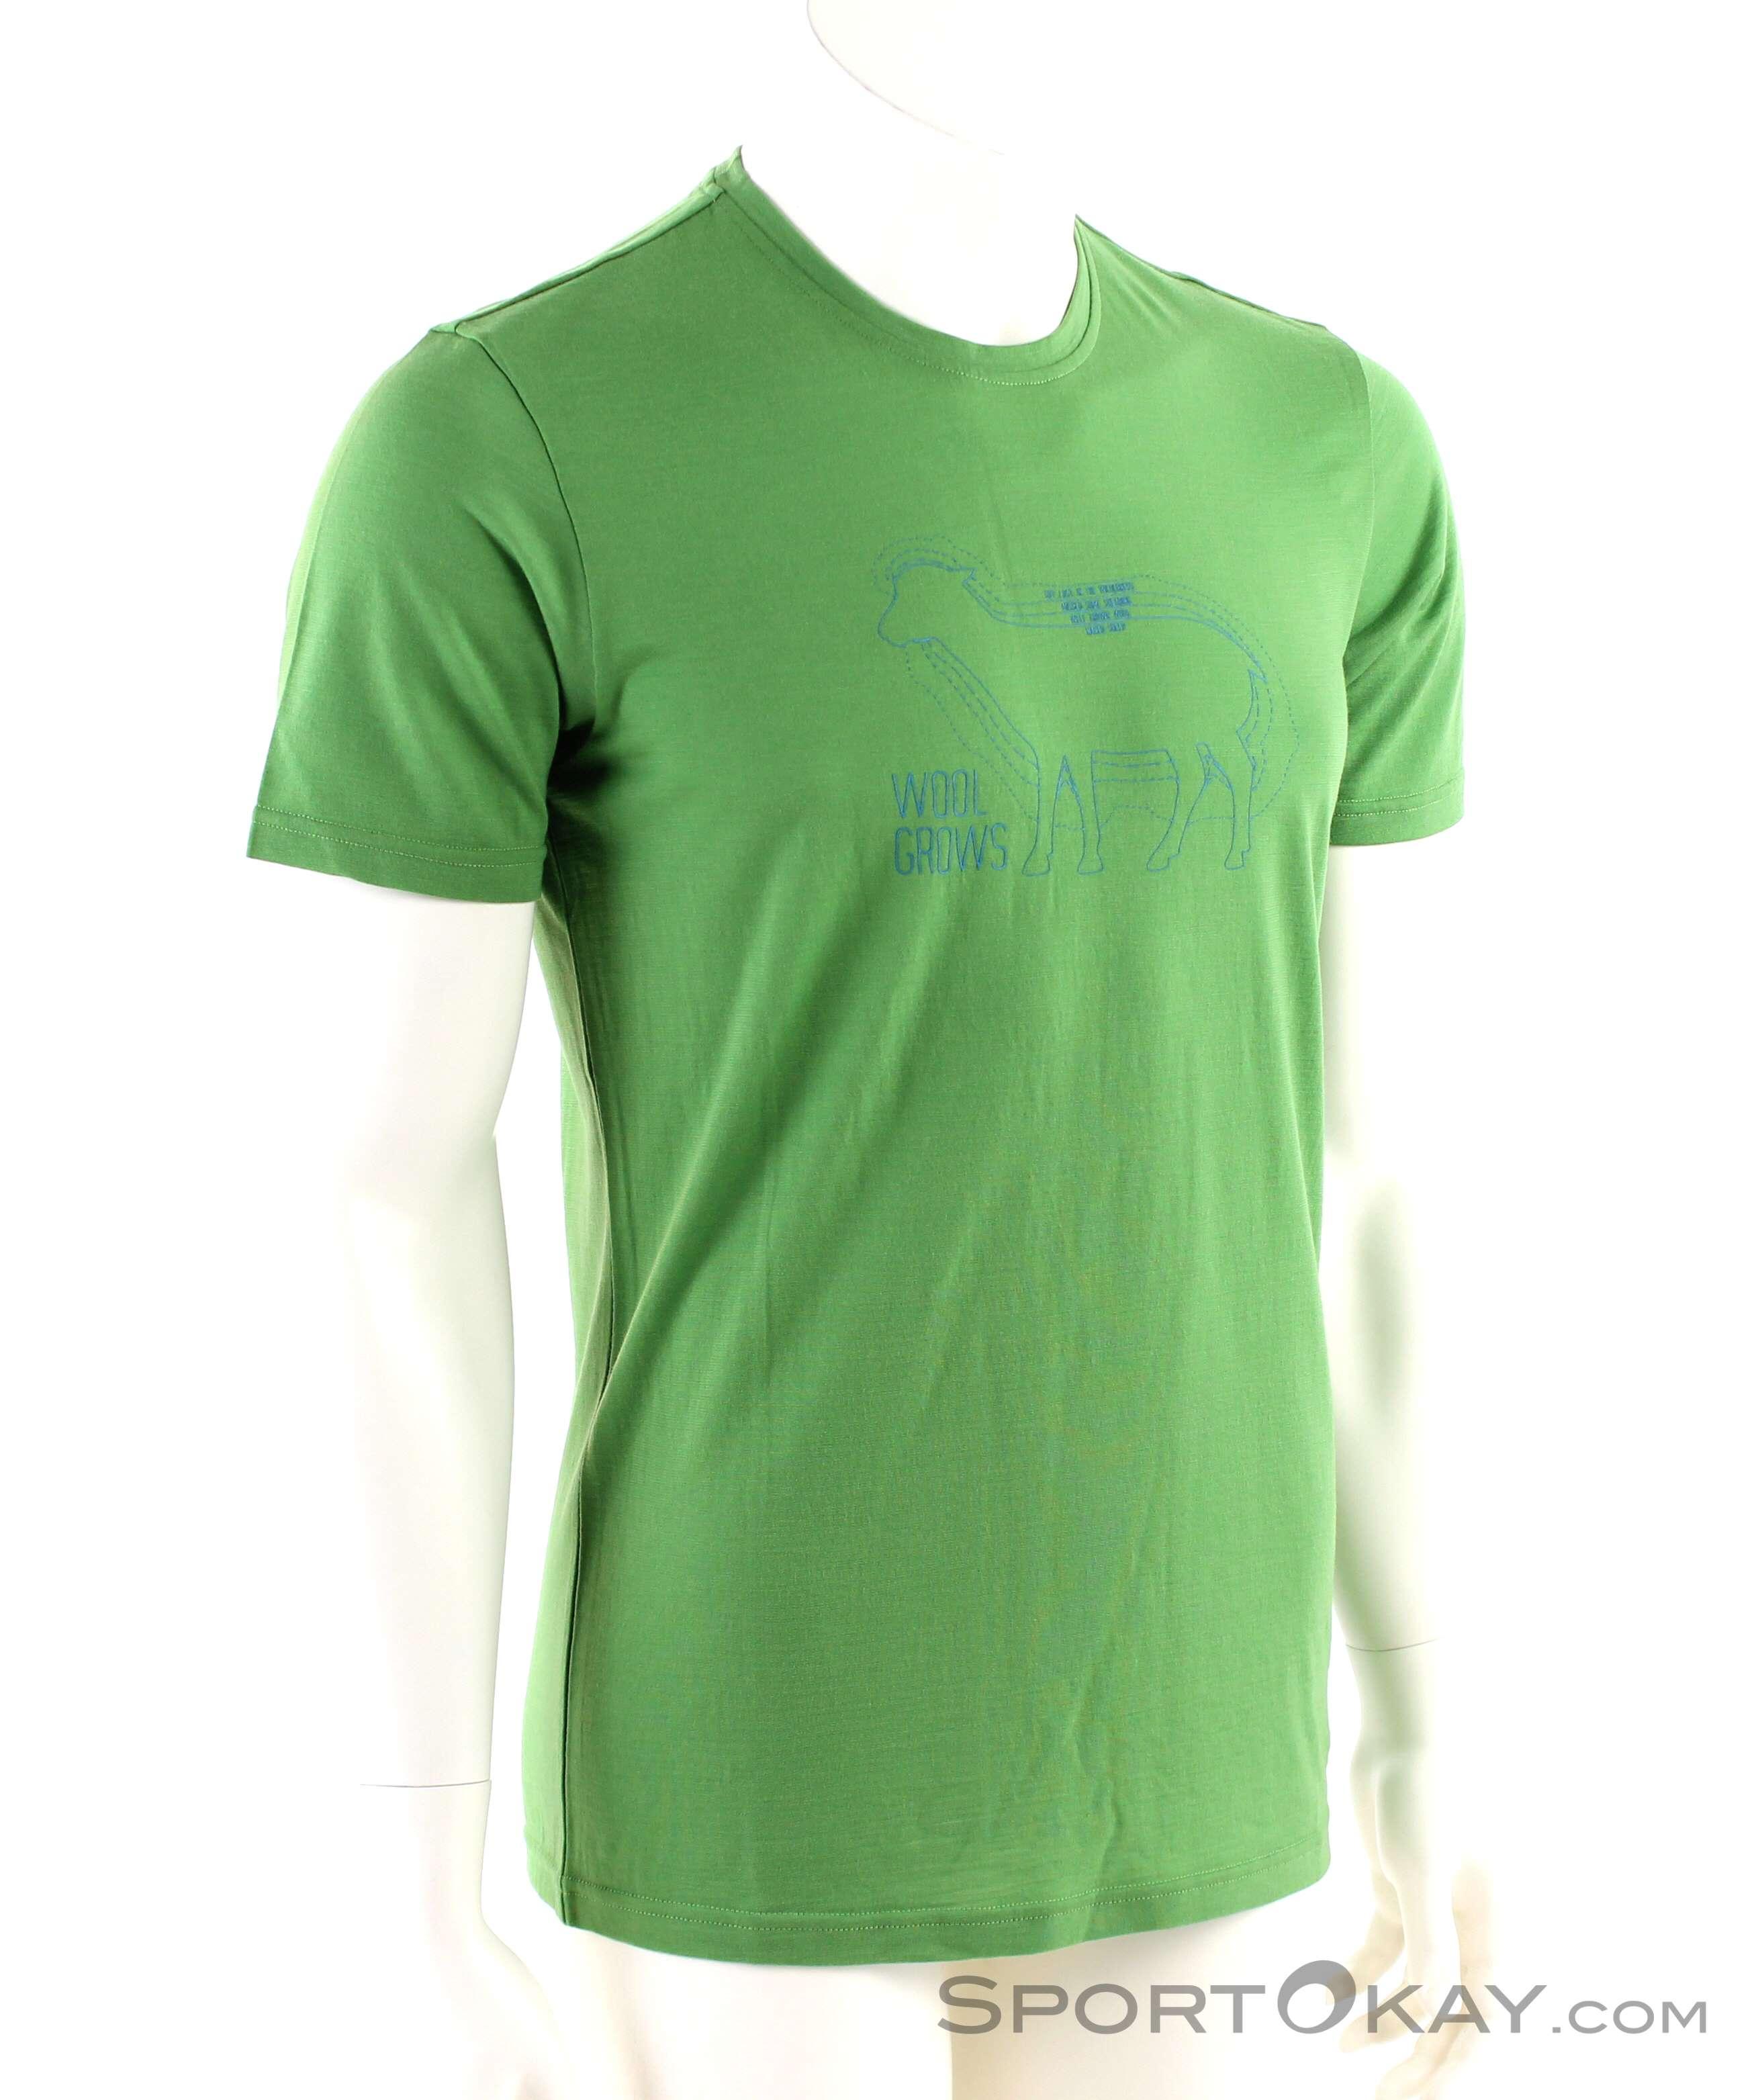 Ortovox Cool Wool Grows Herren T-Shirt-Grün-XL